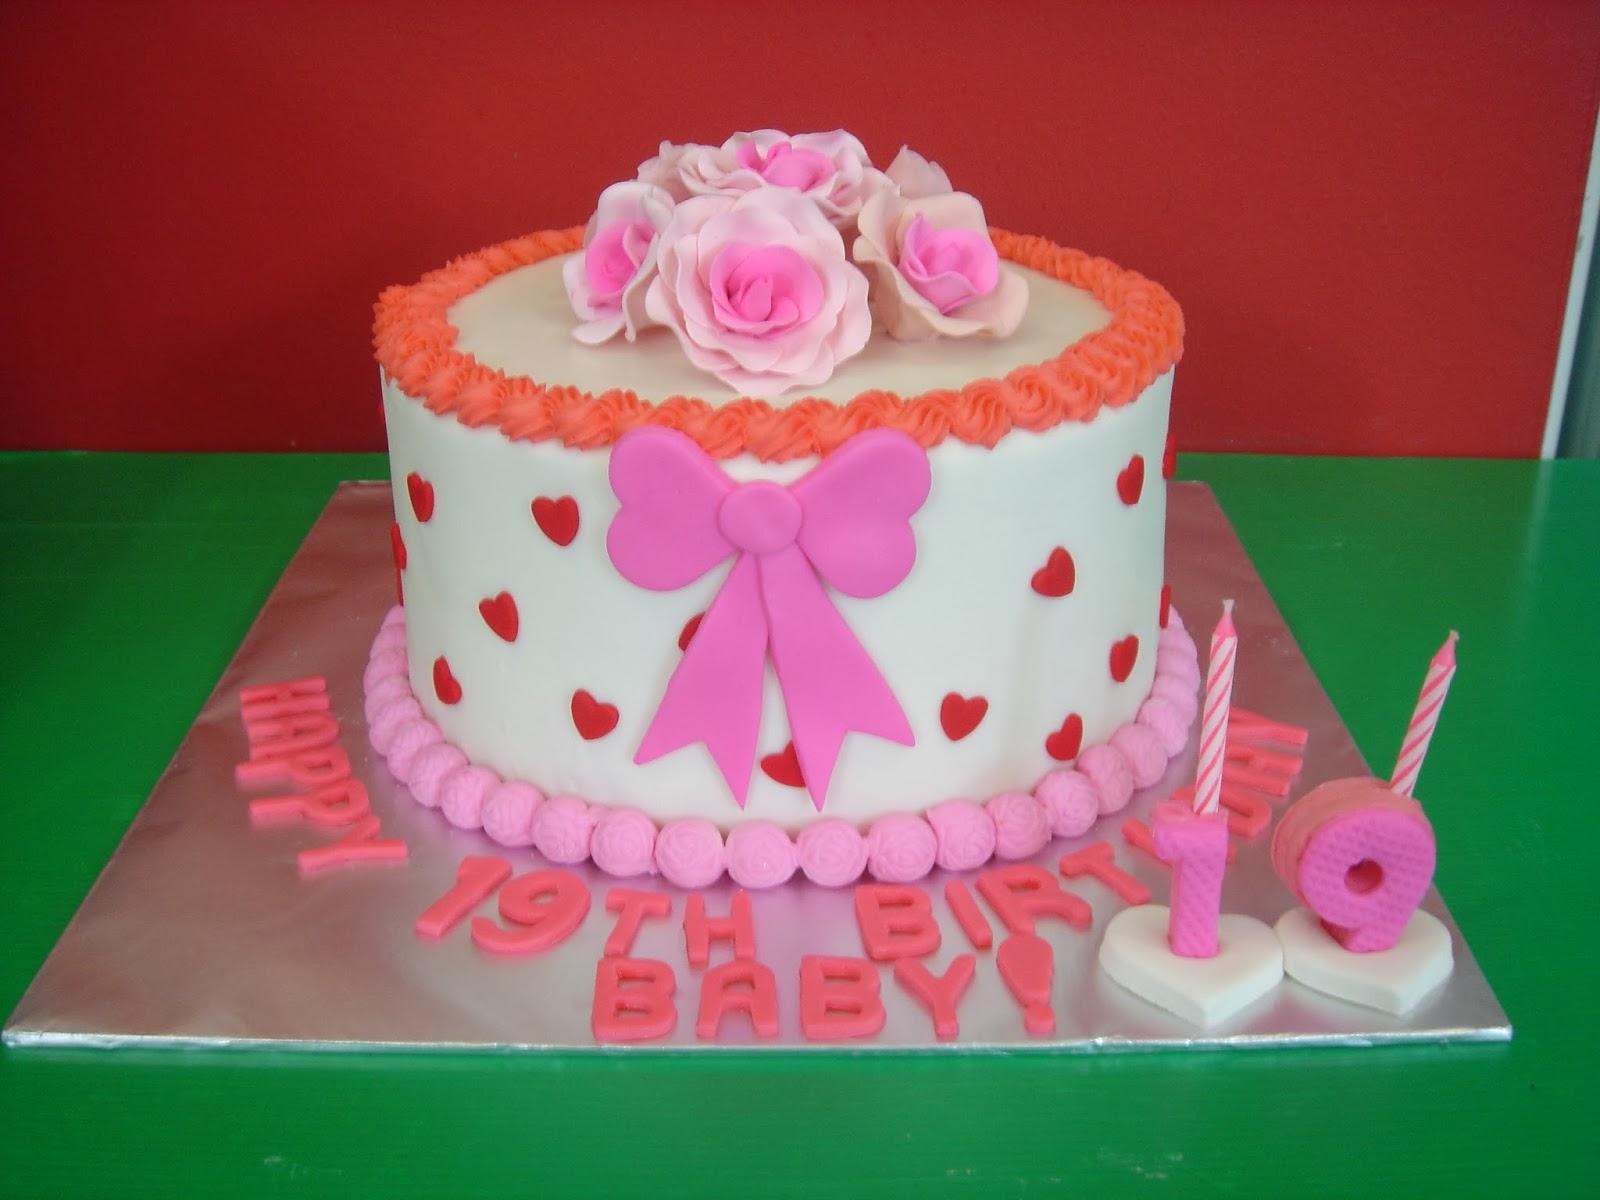 Yochanas Cake Delight Happy 19th Birthday Baby